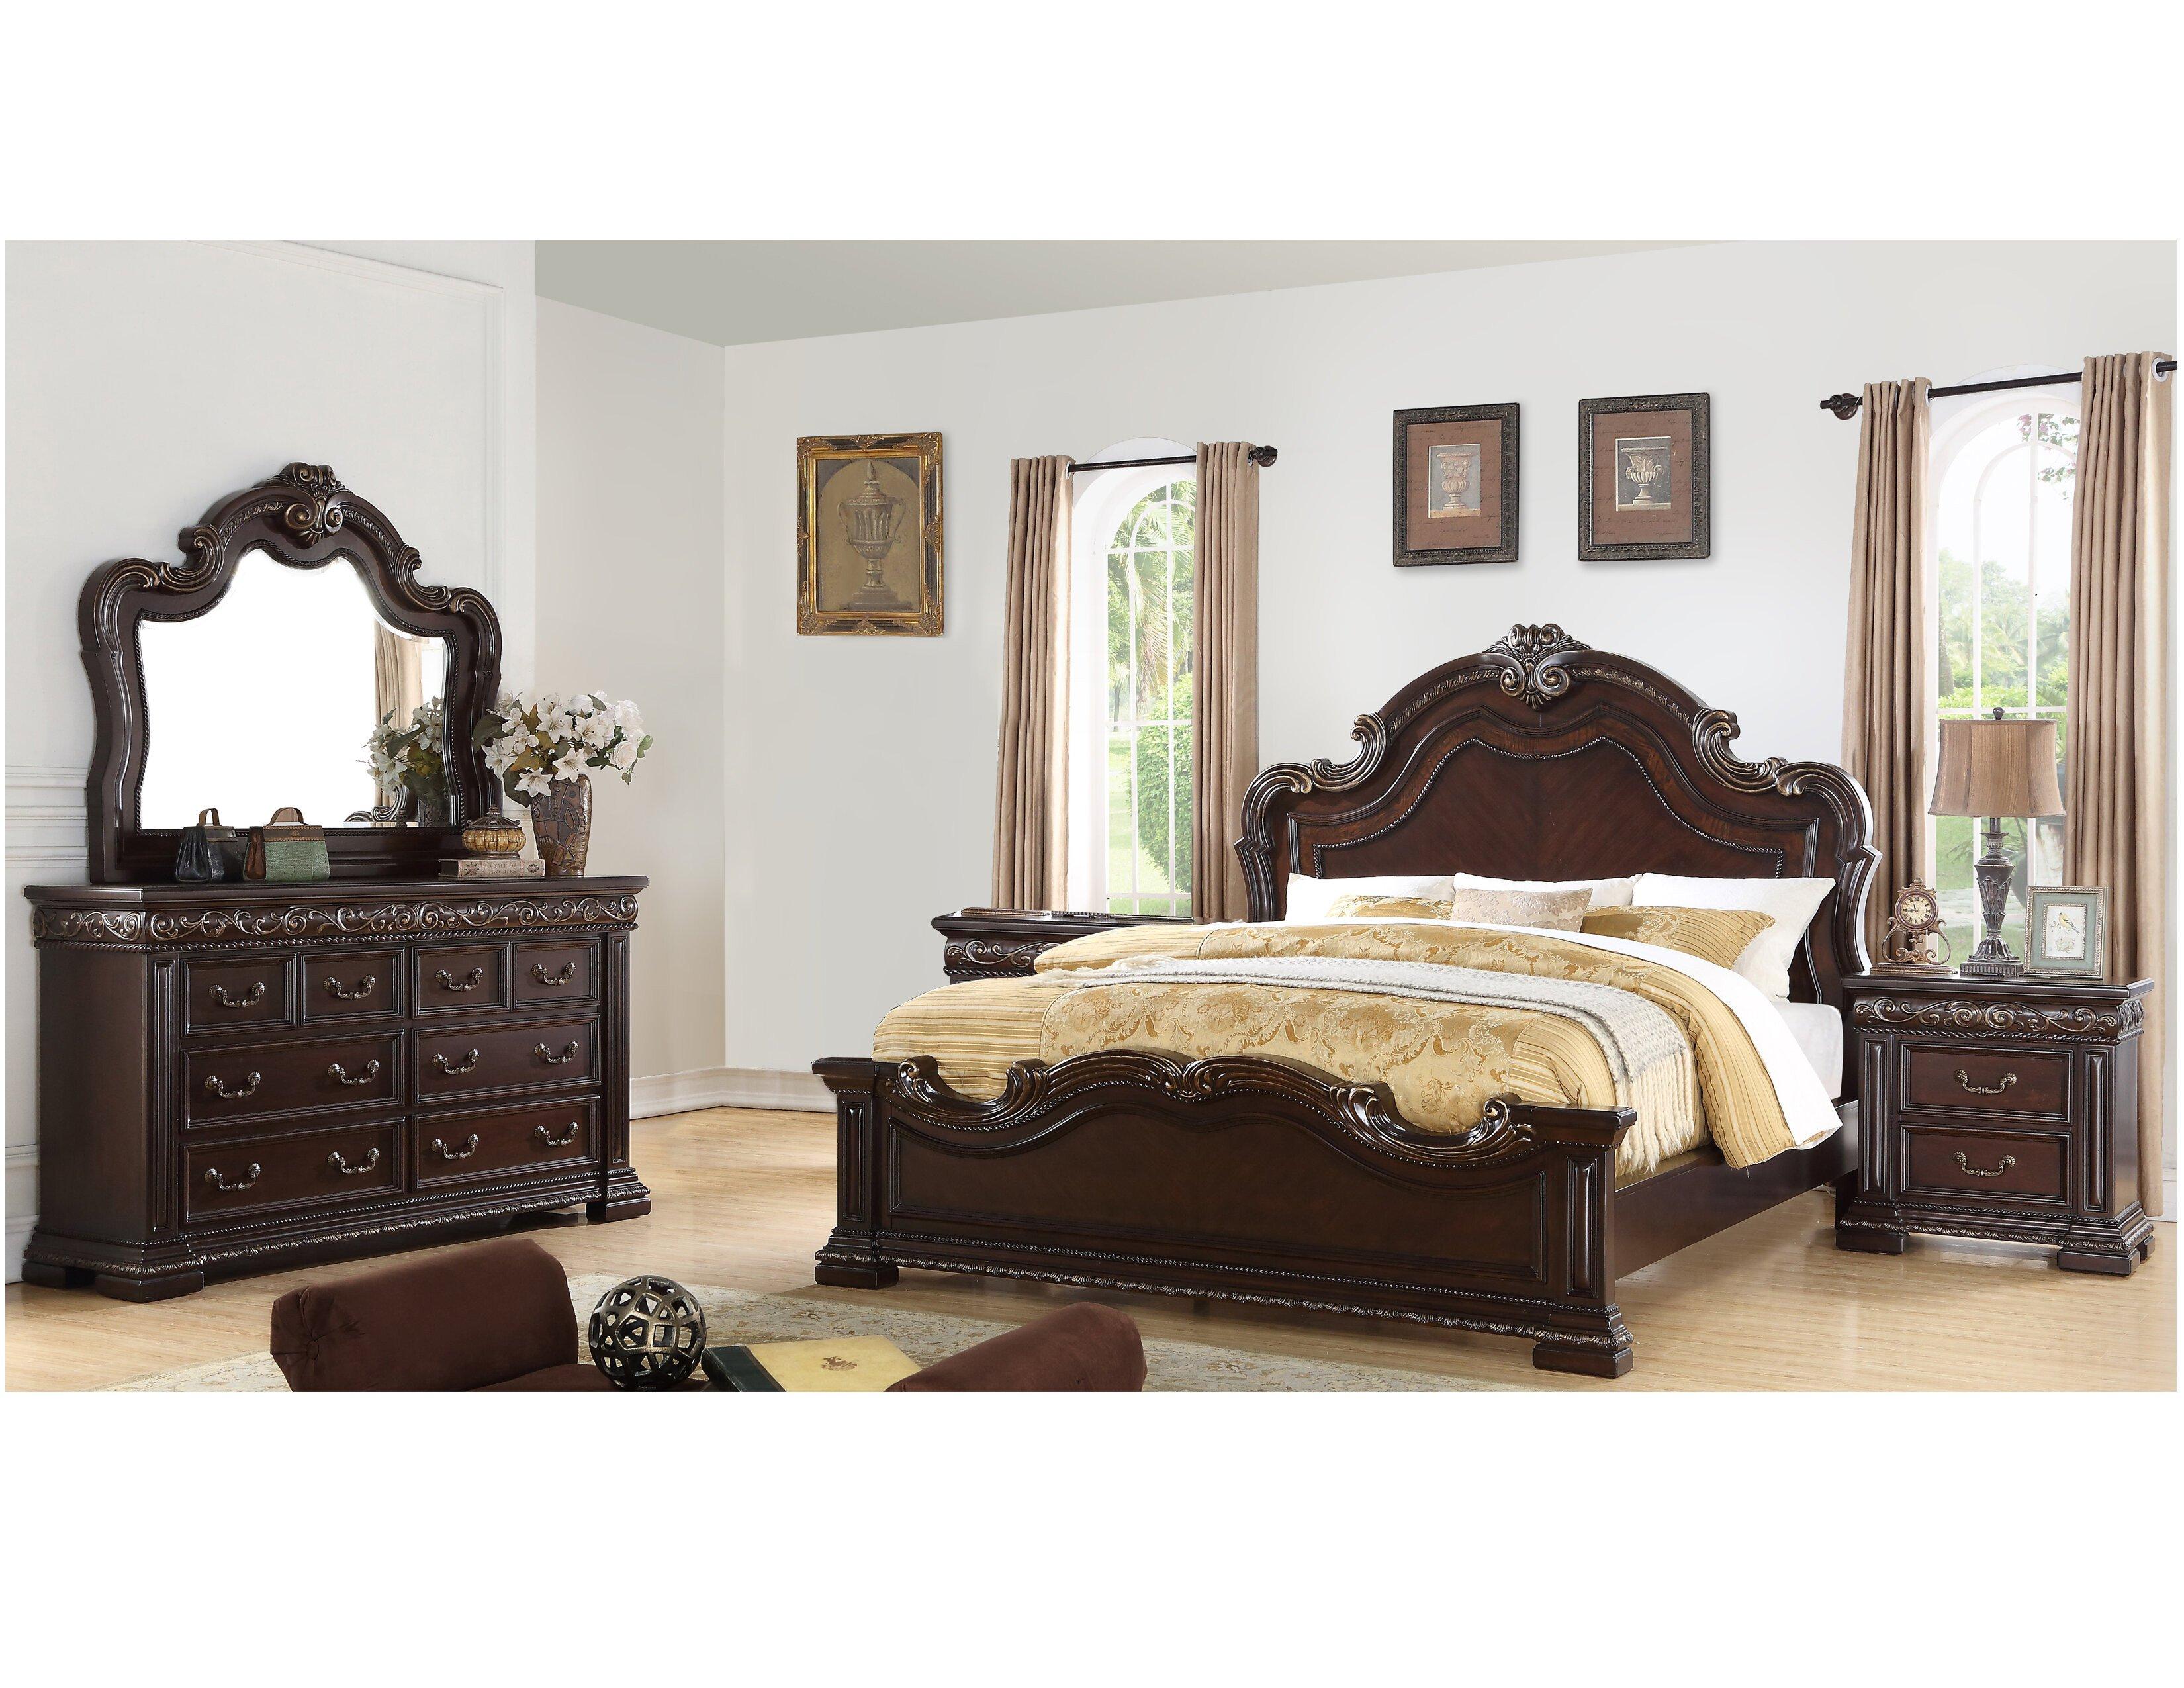 Mirrored Bedroom Furniture Set Beautiful Bannruod Standard solid Wood 5 Piece Bedroom Set